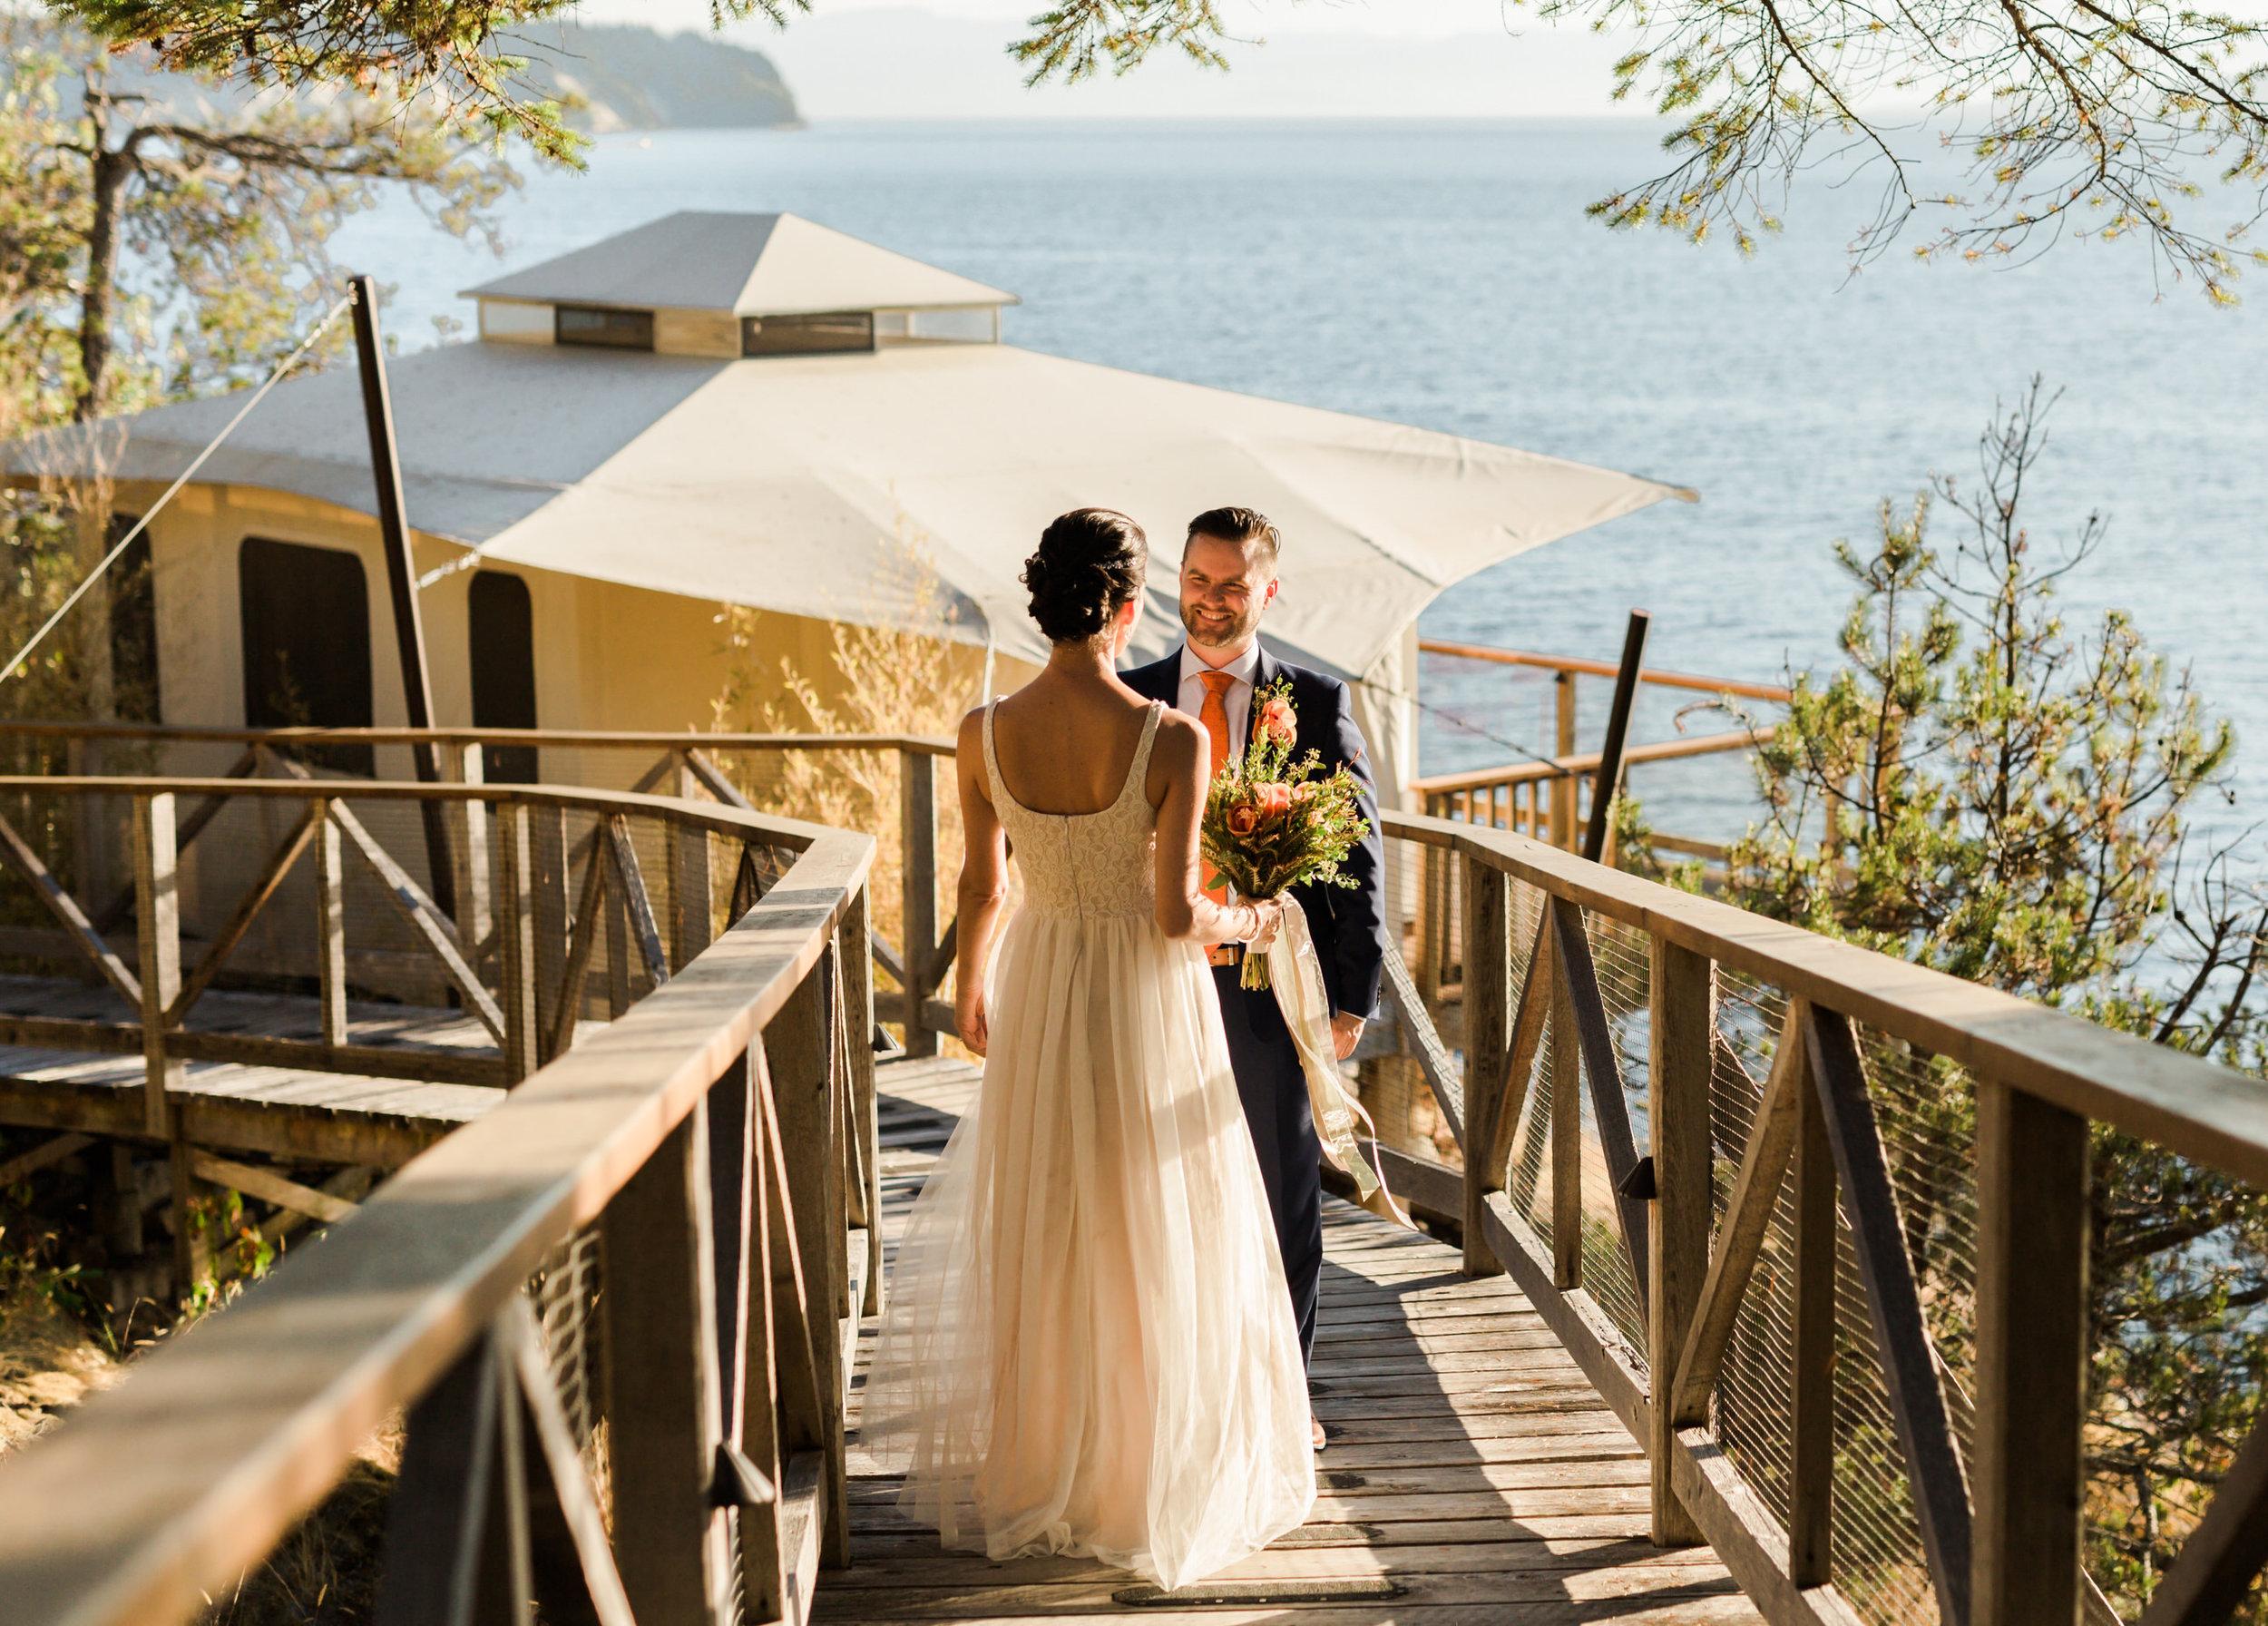 Rockwater Secret Cove Resort Wedding - Sunshine Coast BC Wedding Photographer - Vancouver Wedding Photographer - Sunshine Coast Elopement Photos - IMG_0241.jpg